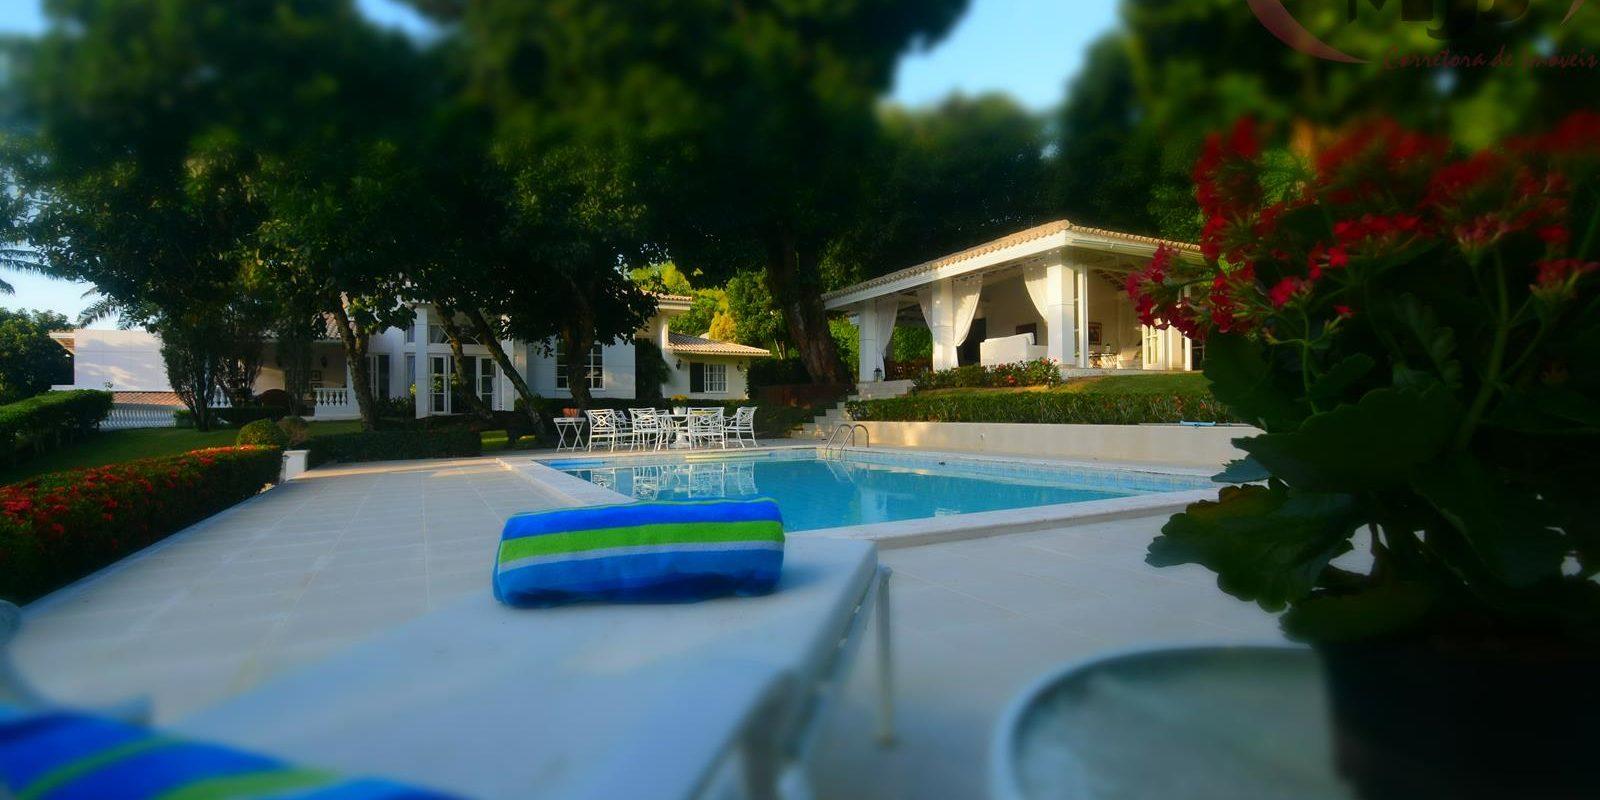 Condomínio Encontro das Águas endereço de luxo Salvador